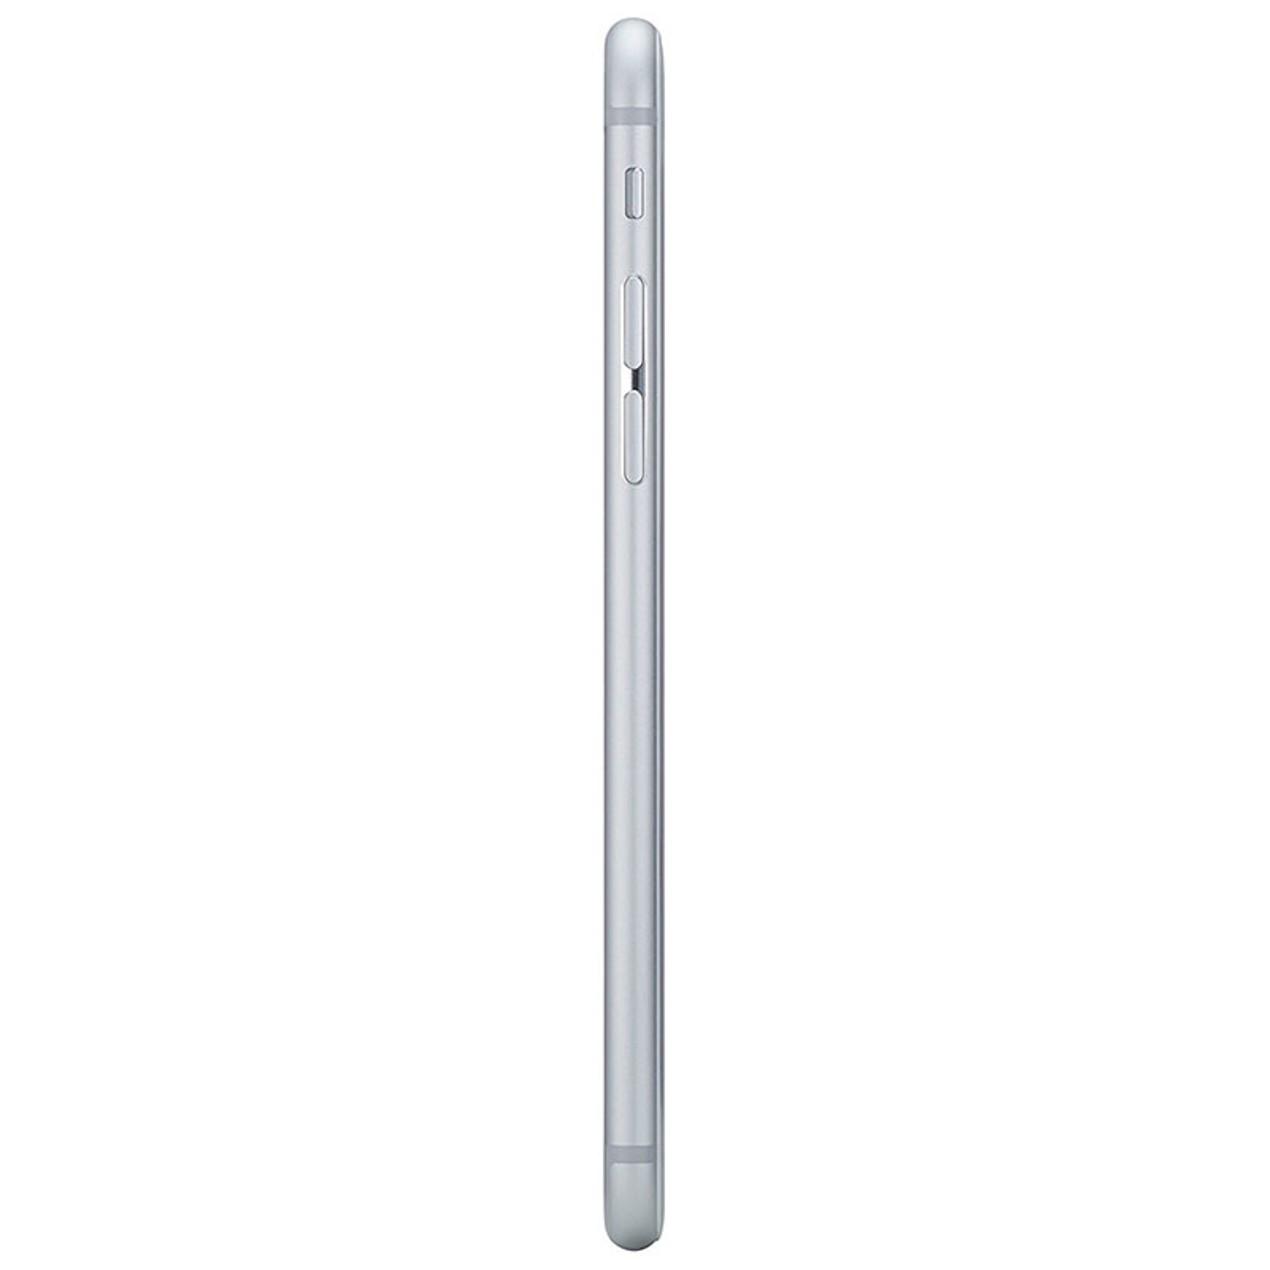 Apple Iphone 6 64gb Gsm Unlocked Black Gold Or Silver Tanga Grey